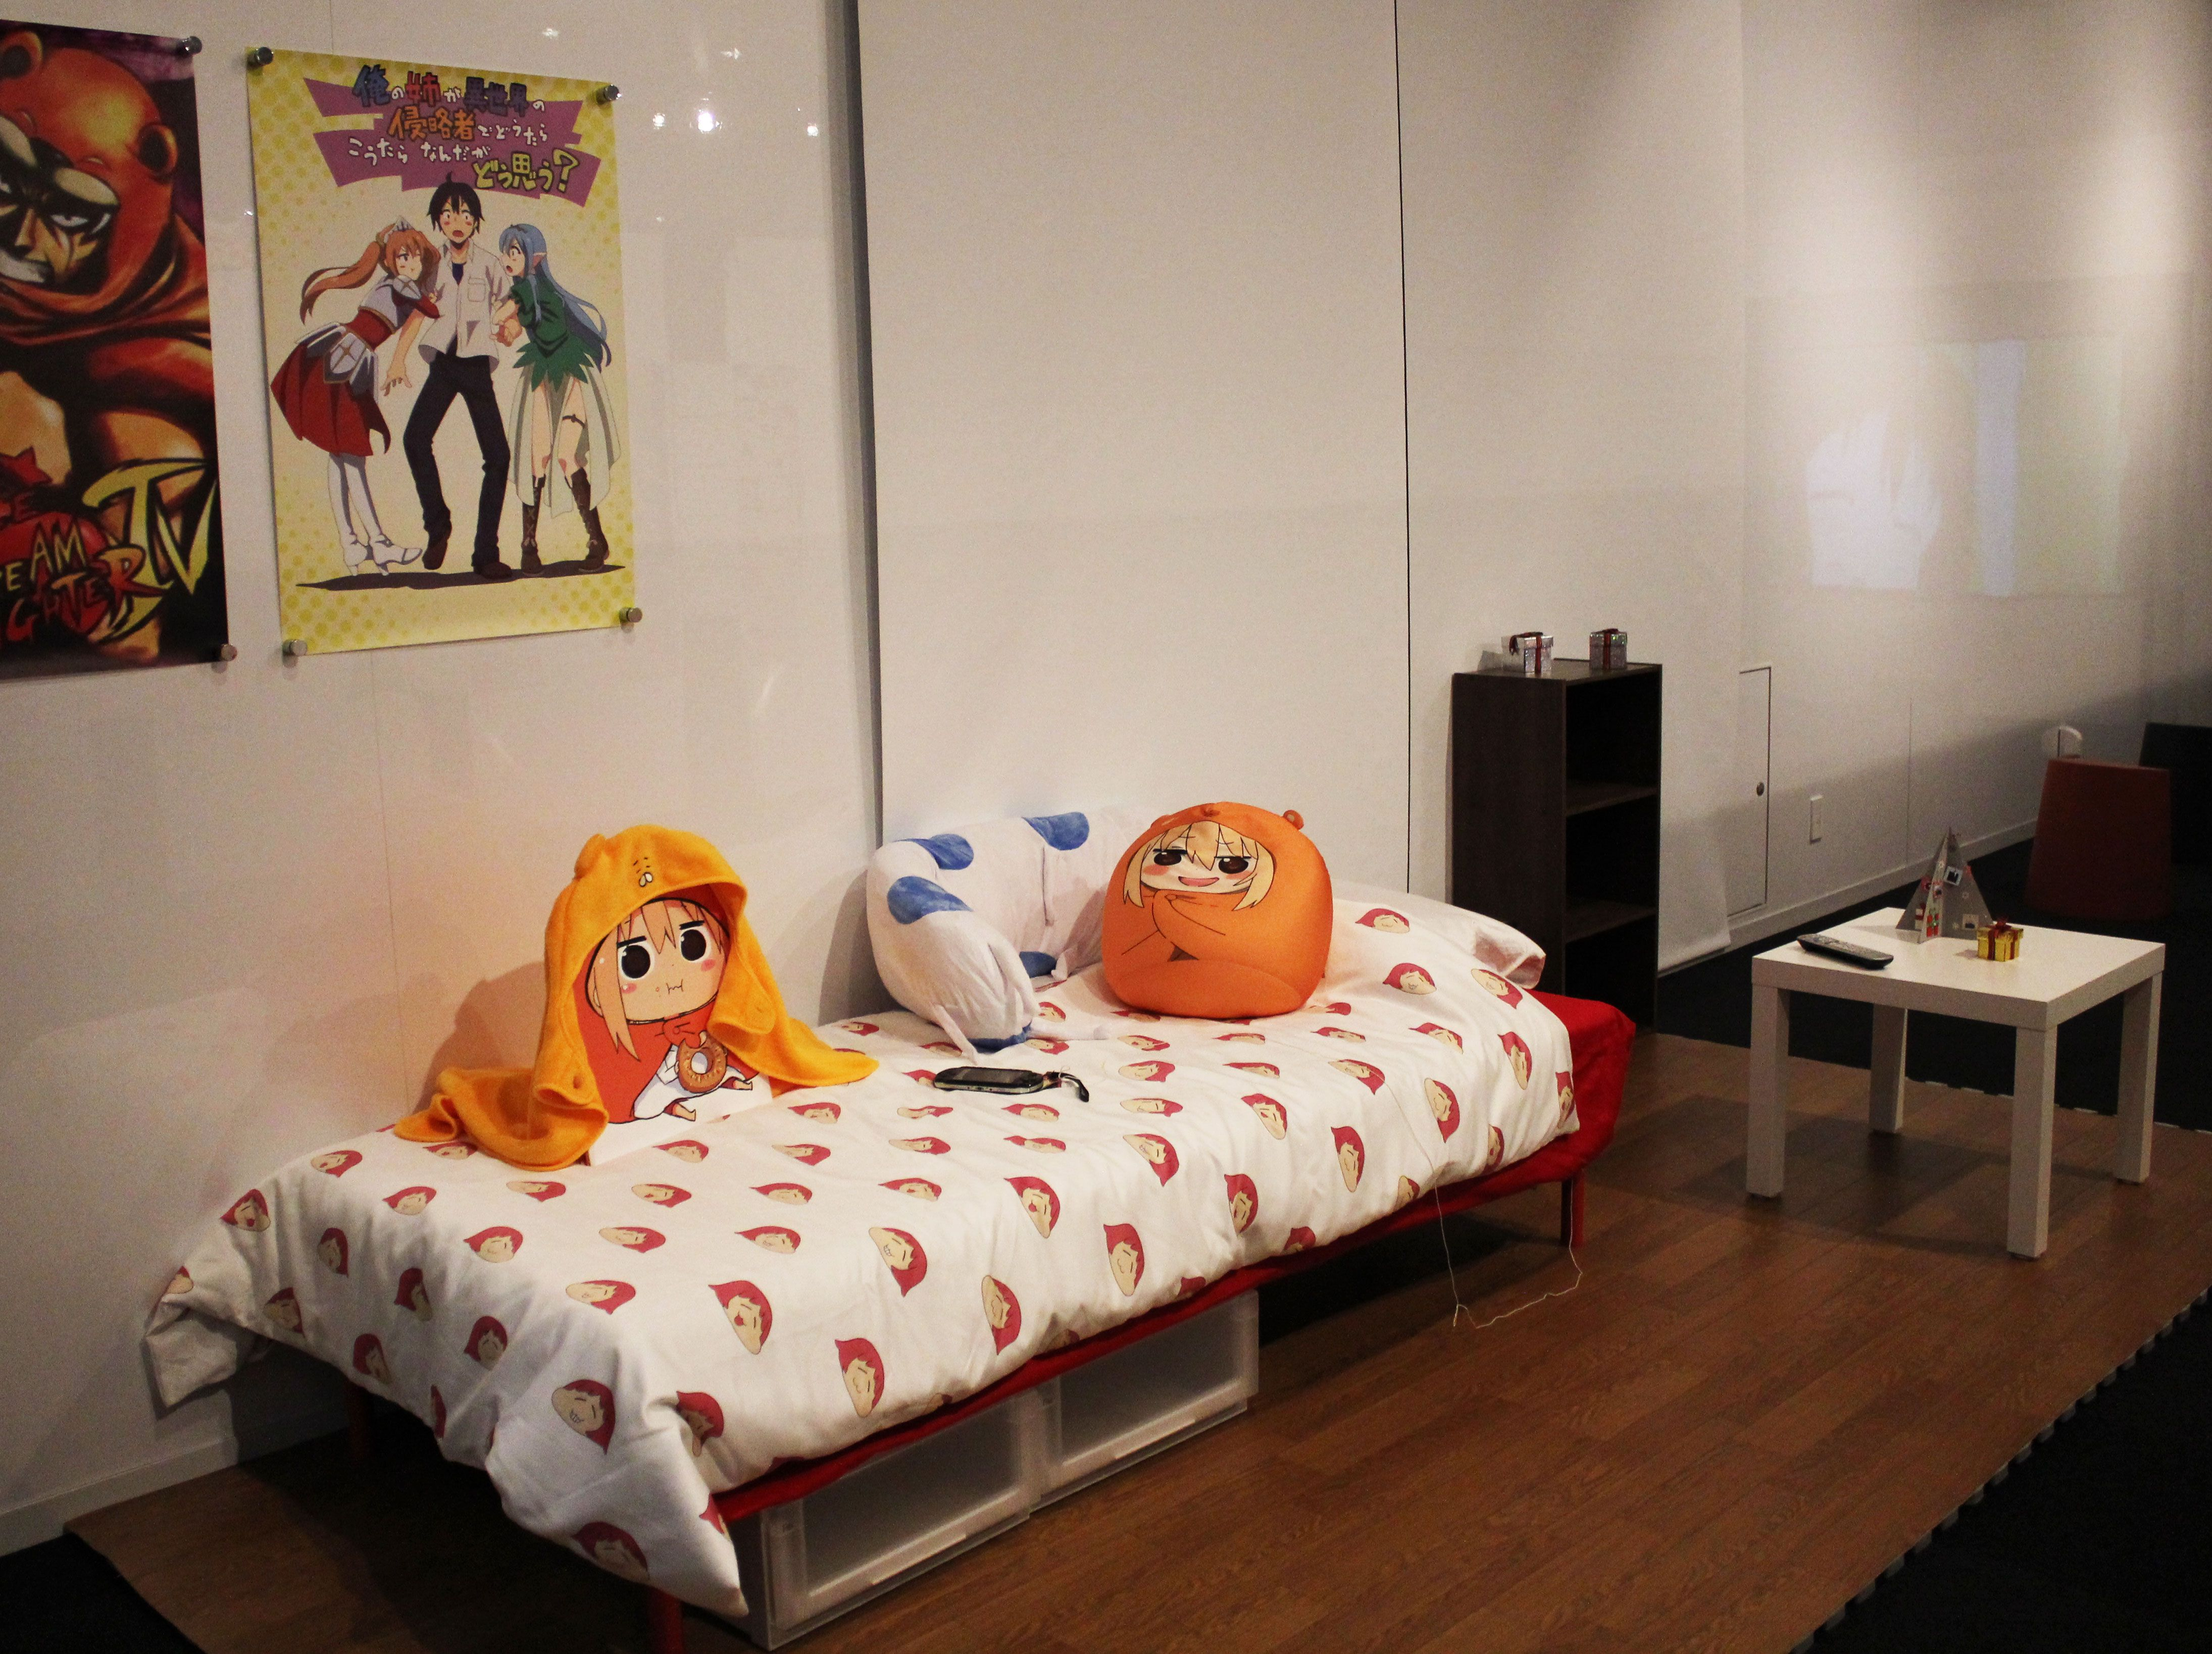 Ever wonder what umaruchans room would look like in real